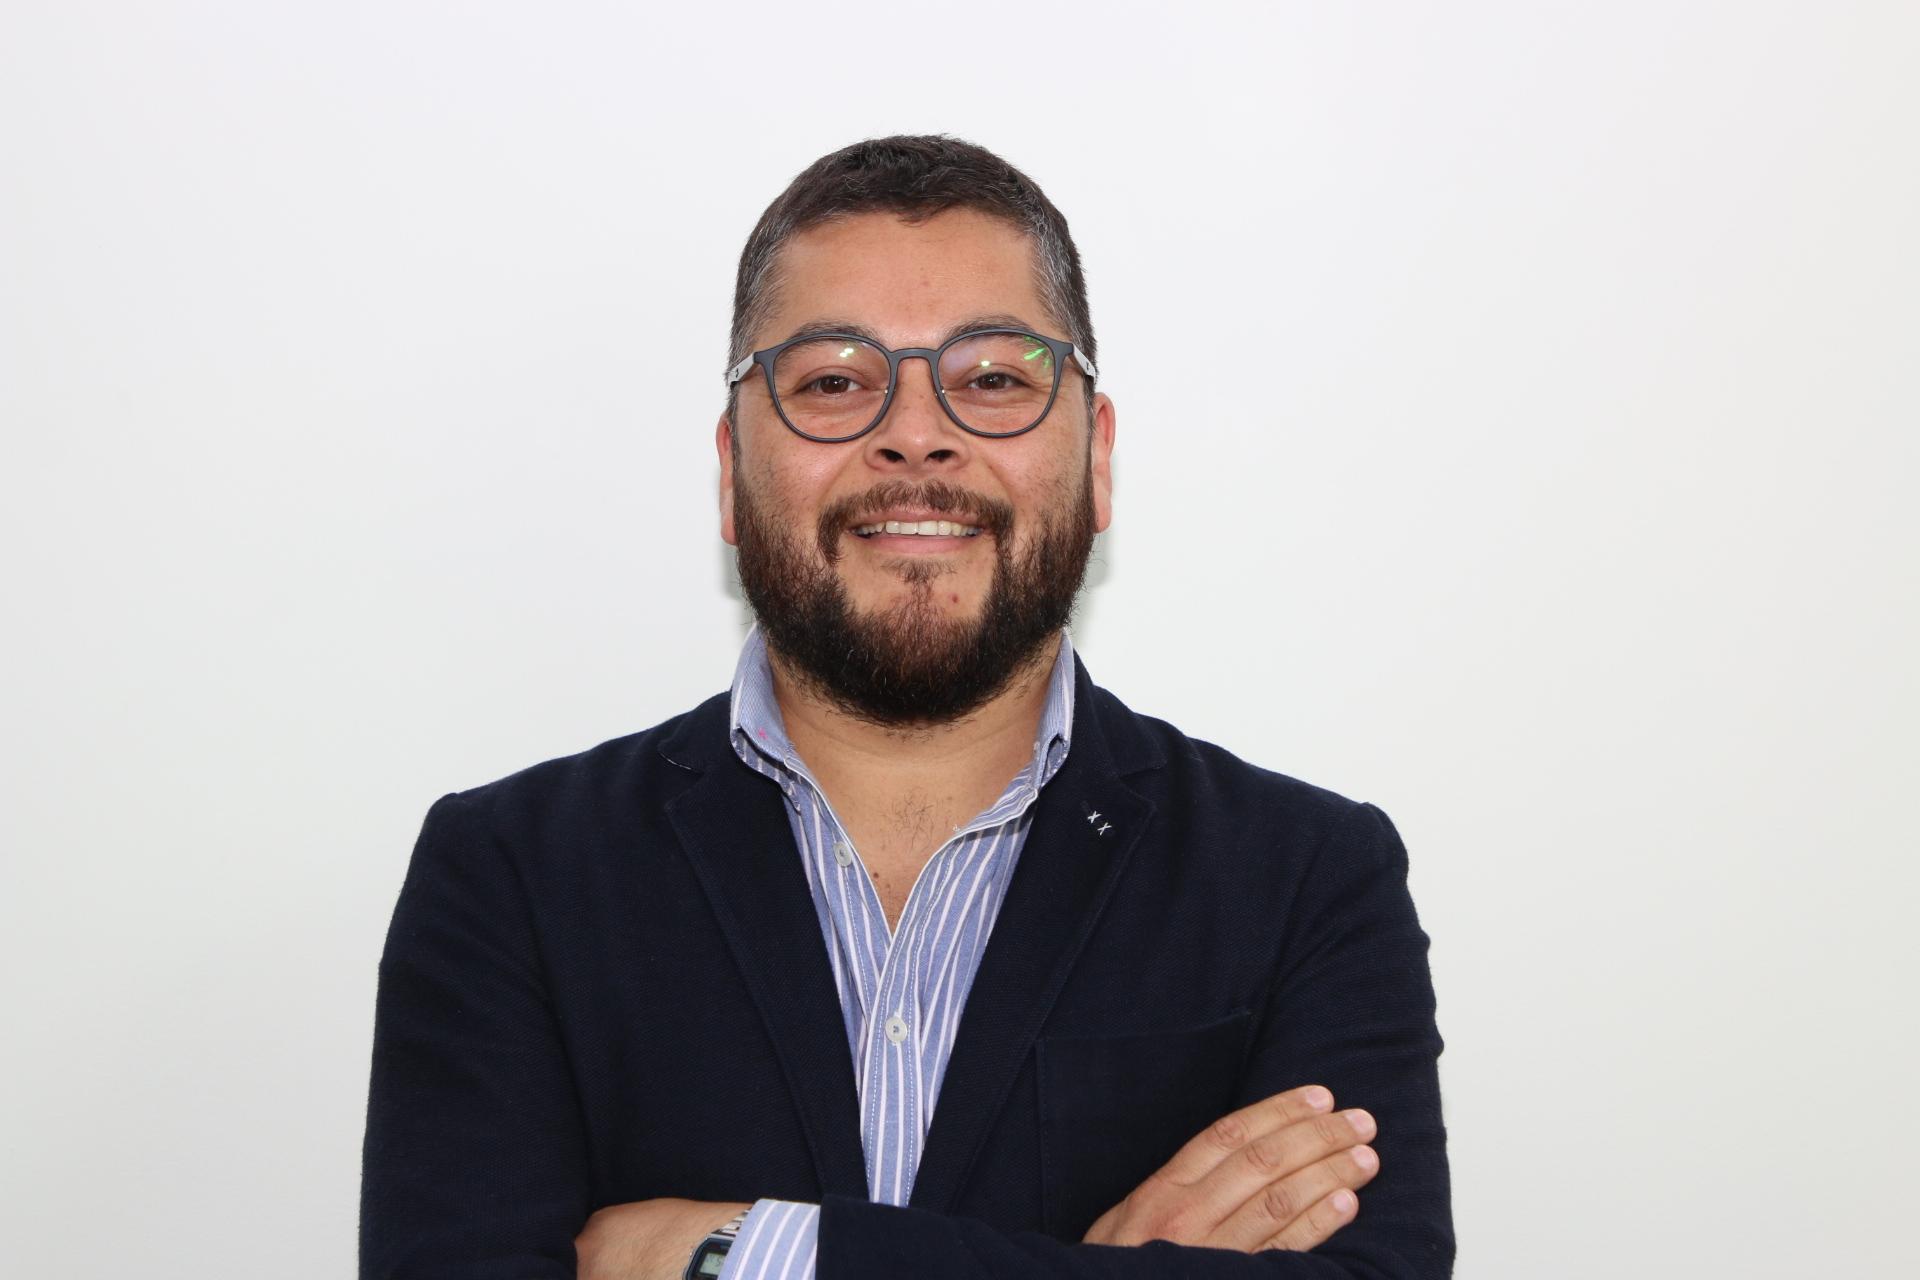 Héctor Guzmán Marín